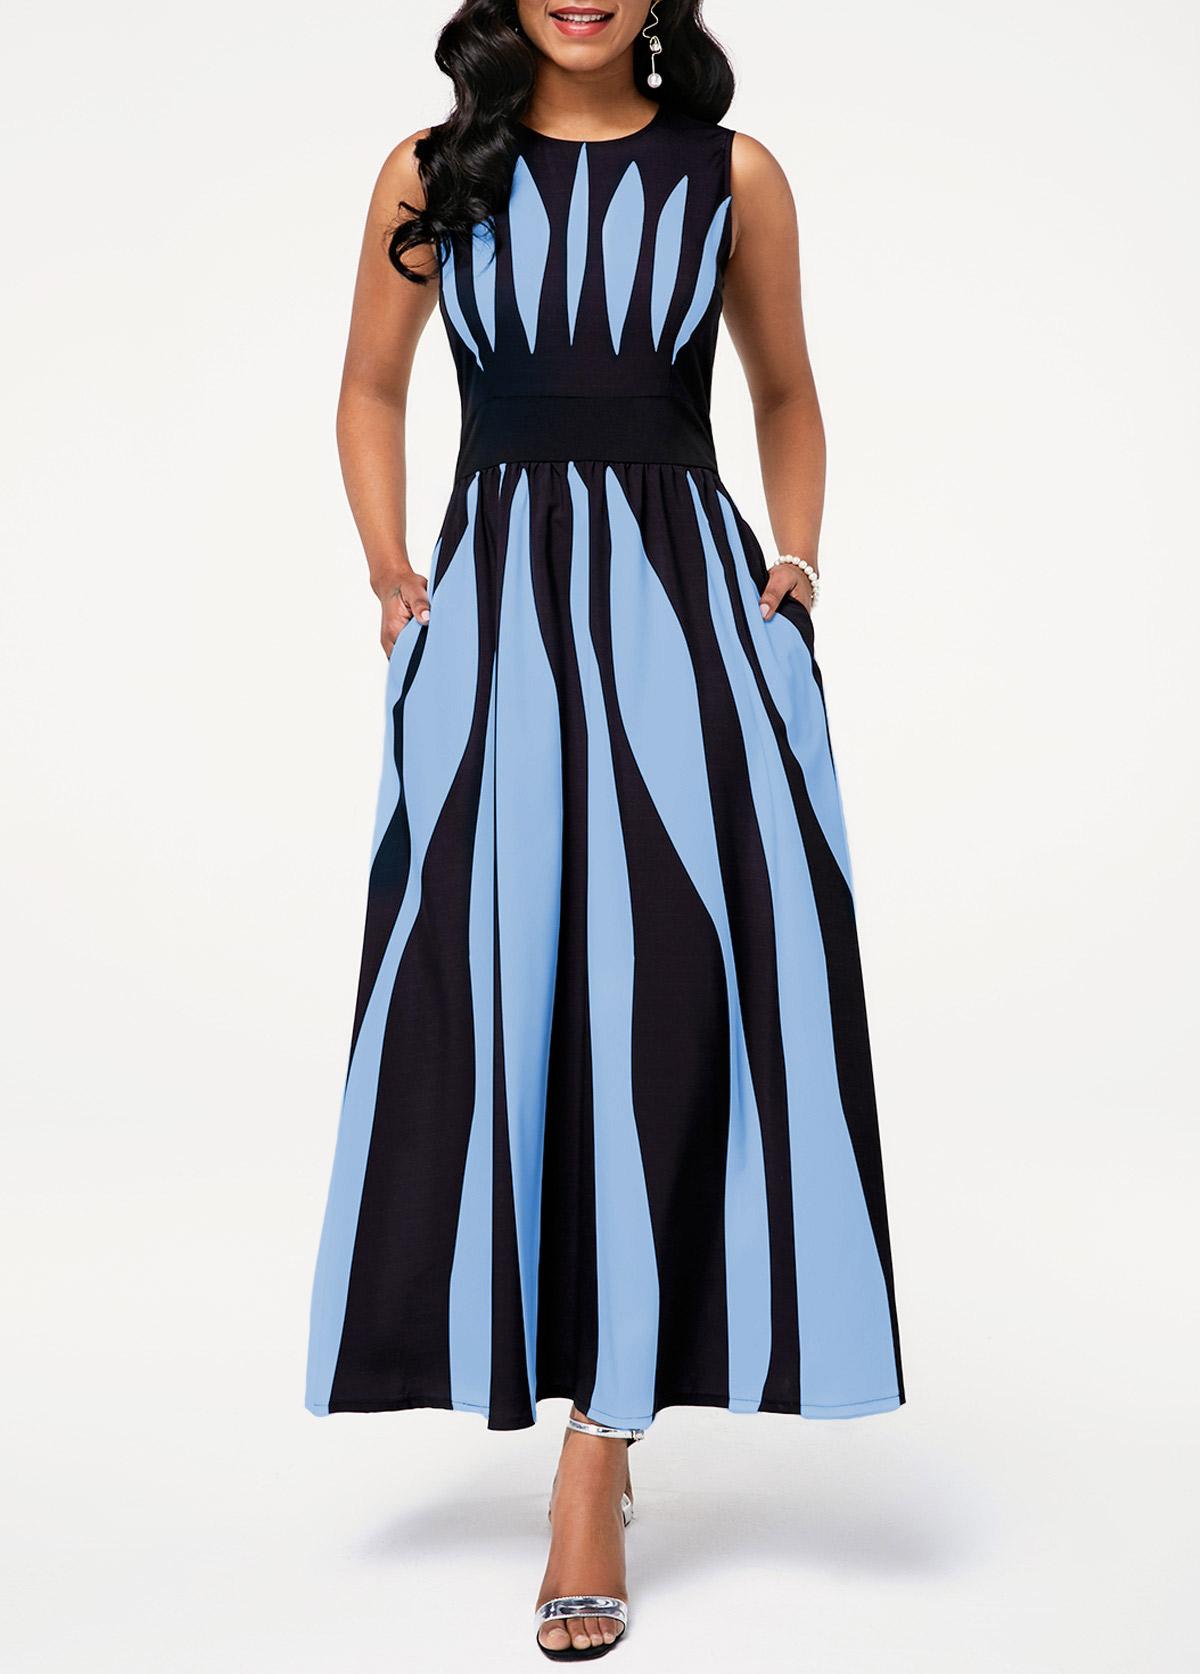 Round Neck Sleeveless Stripe Print Pocket Dress